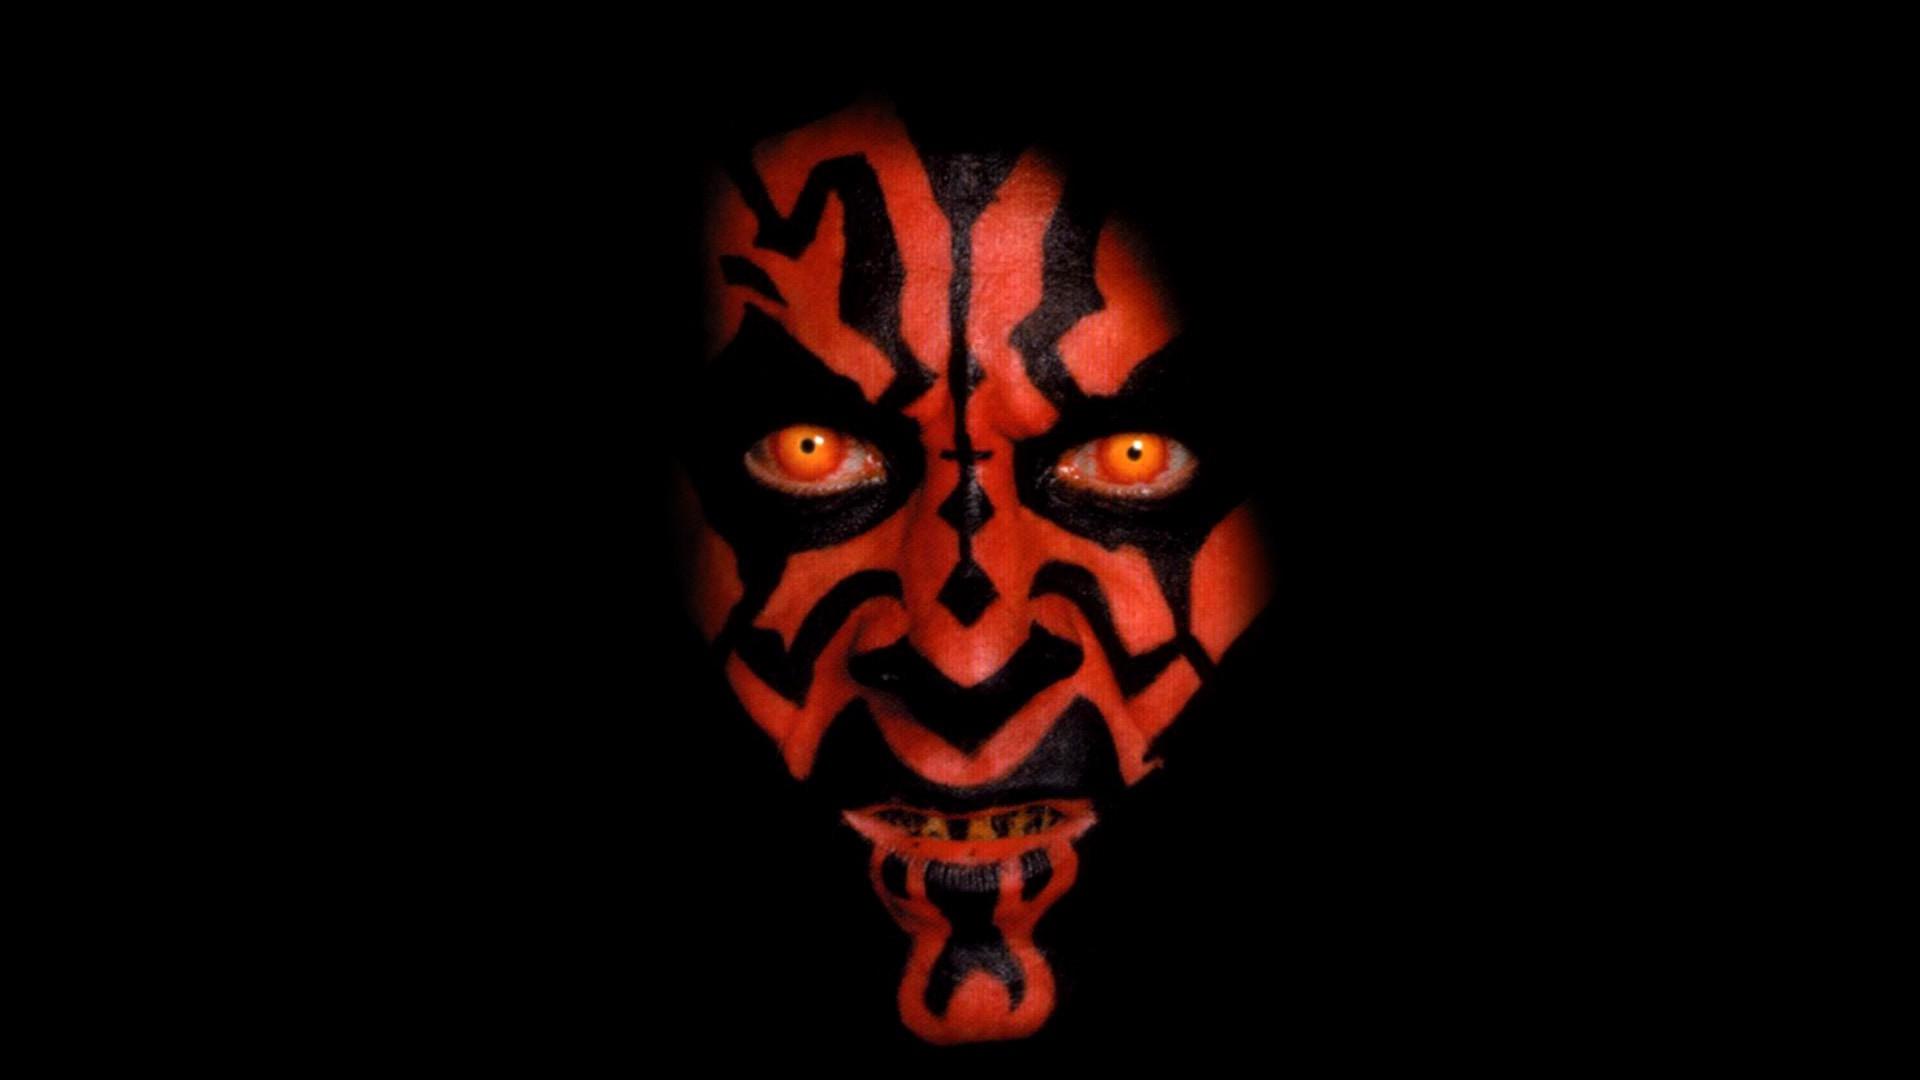 Most Inspiring Wallpaper Halloween Star Wars - Star-Wars-Halloween-pumpkin-orange-skull-demon-Jack-O-Lantern-ART-darkness-carving-graphics-1920x1080-px-computer-wallpaper-fictional-character-font-supernatural-creature-786956  Collection_76755.jpg